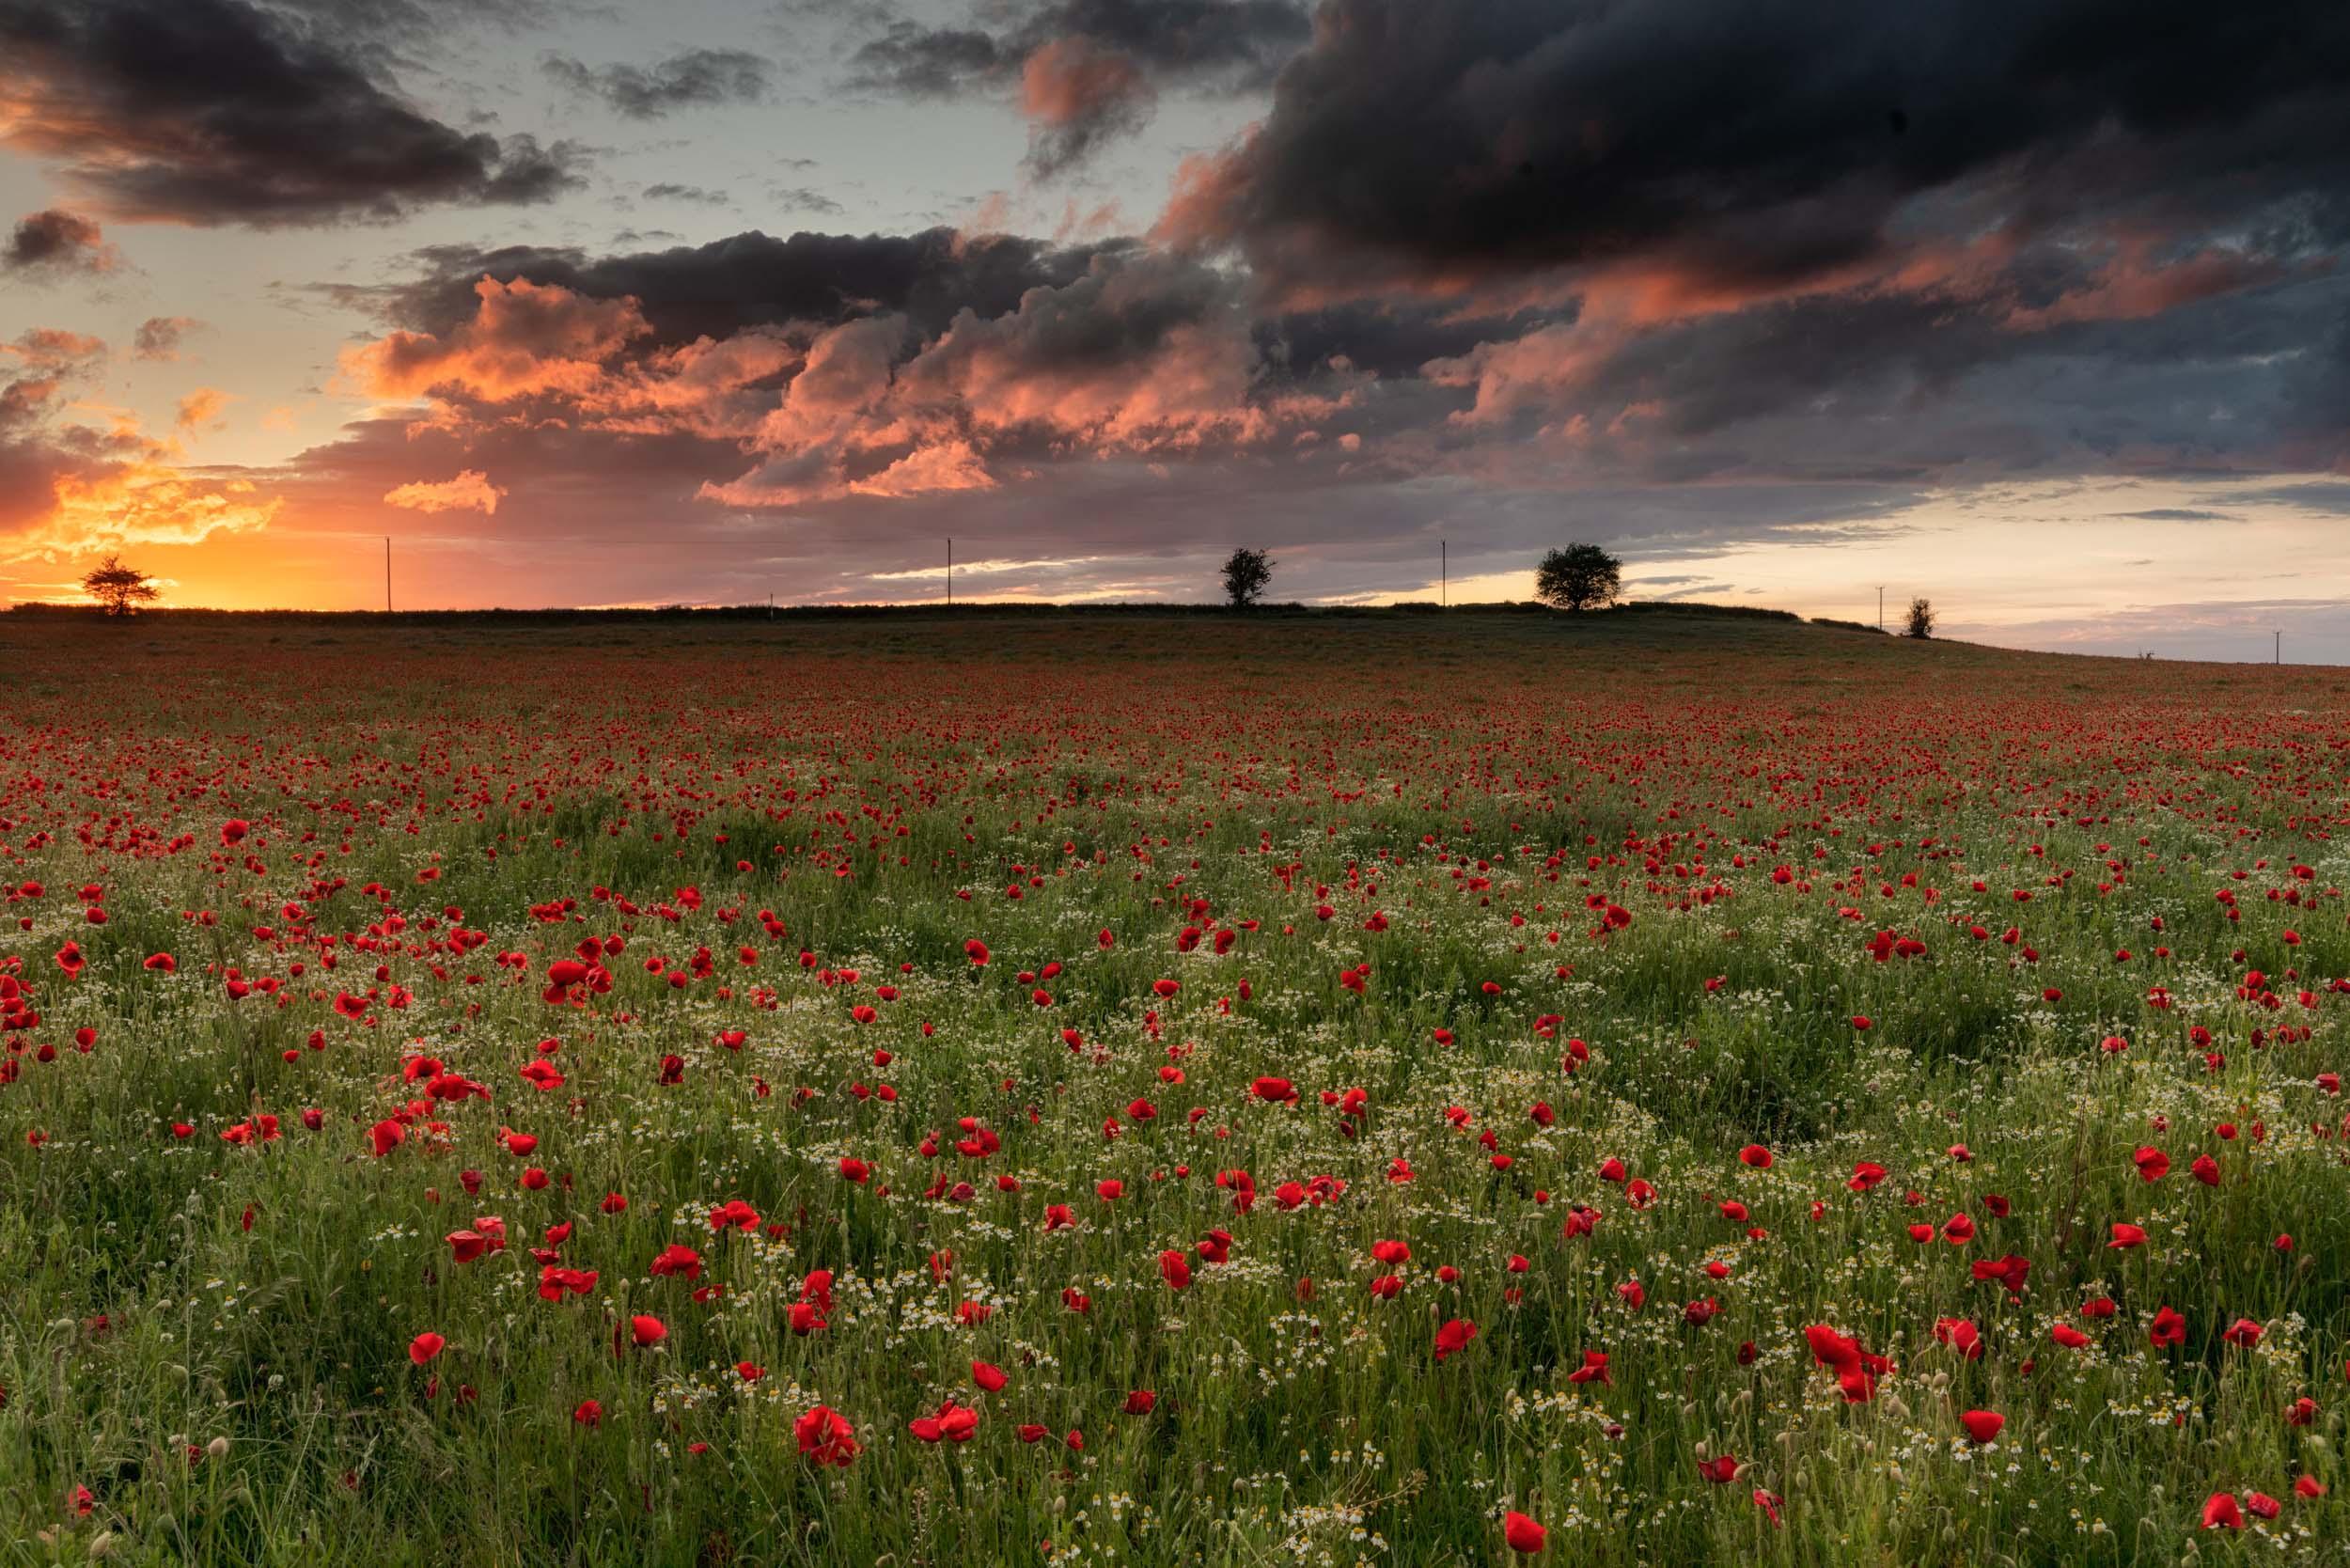 8th June - Sunset Poppy Field